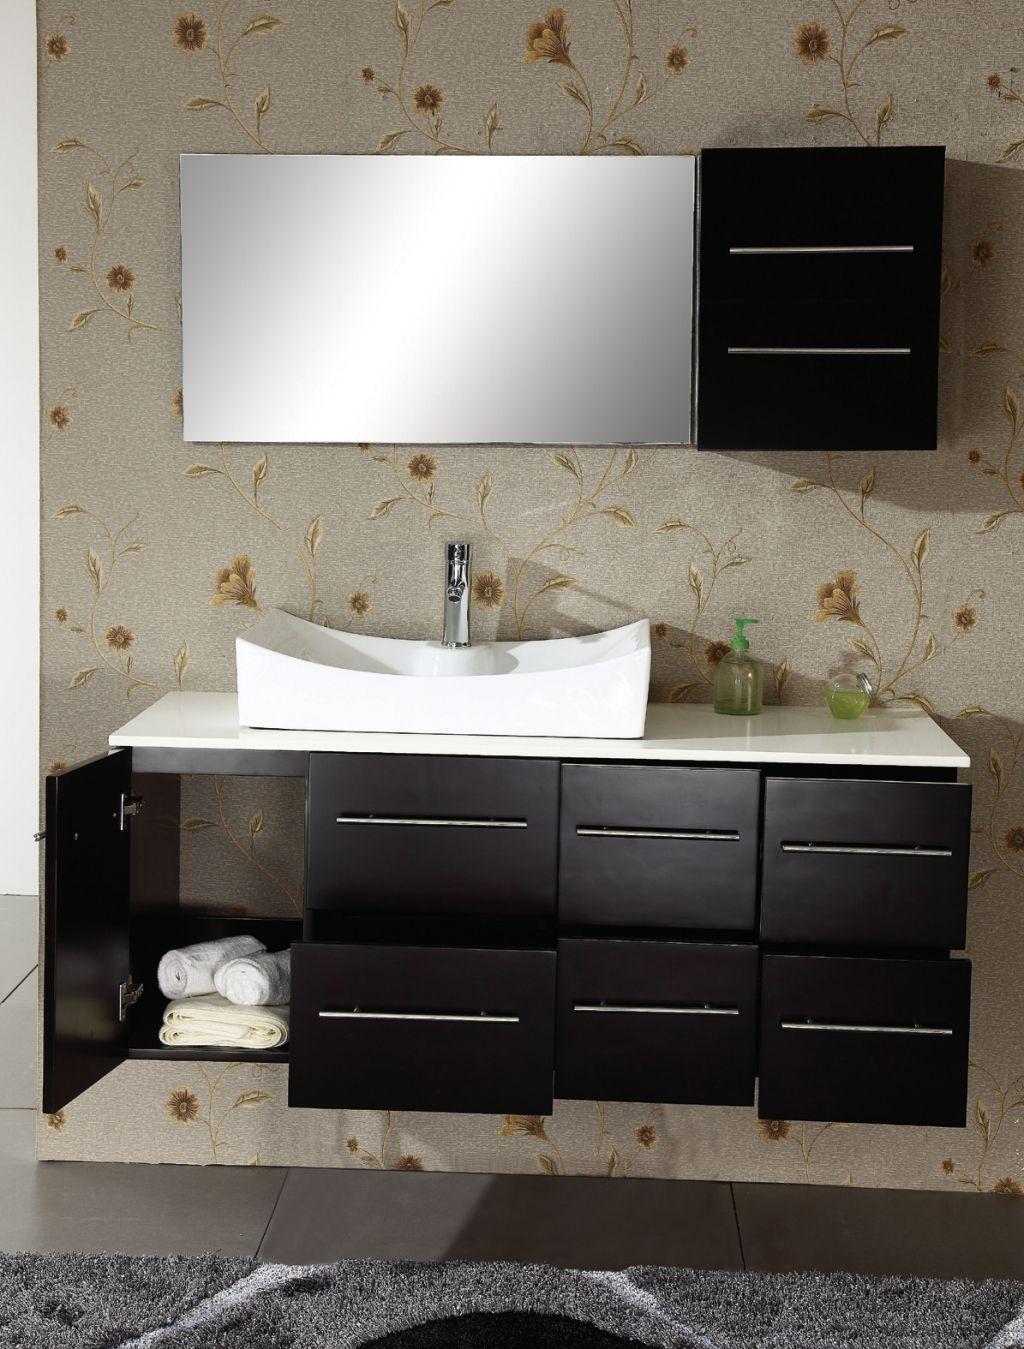 Bathroom awesome bathroom sink design on black teak wooden washing